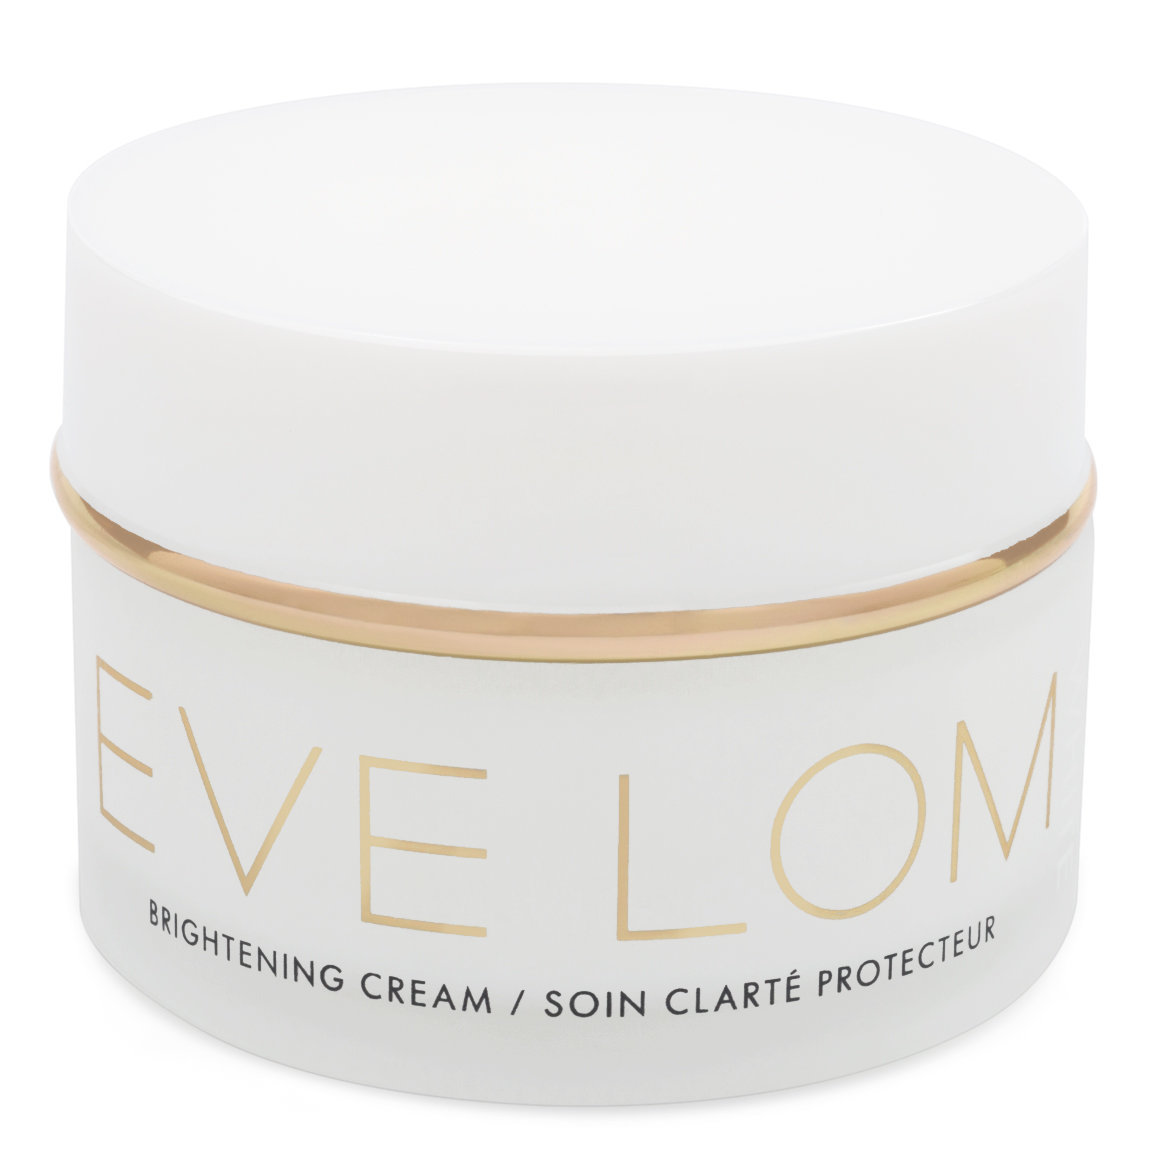 EVE LOM White Brightening Cream product swatch.